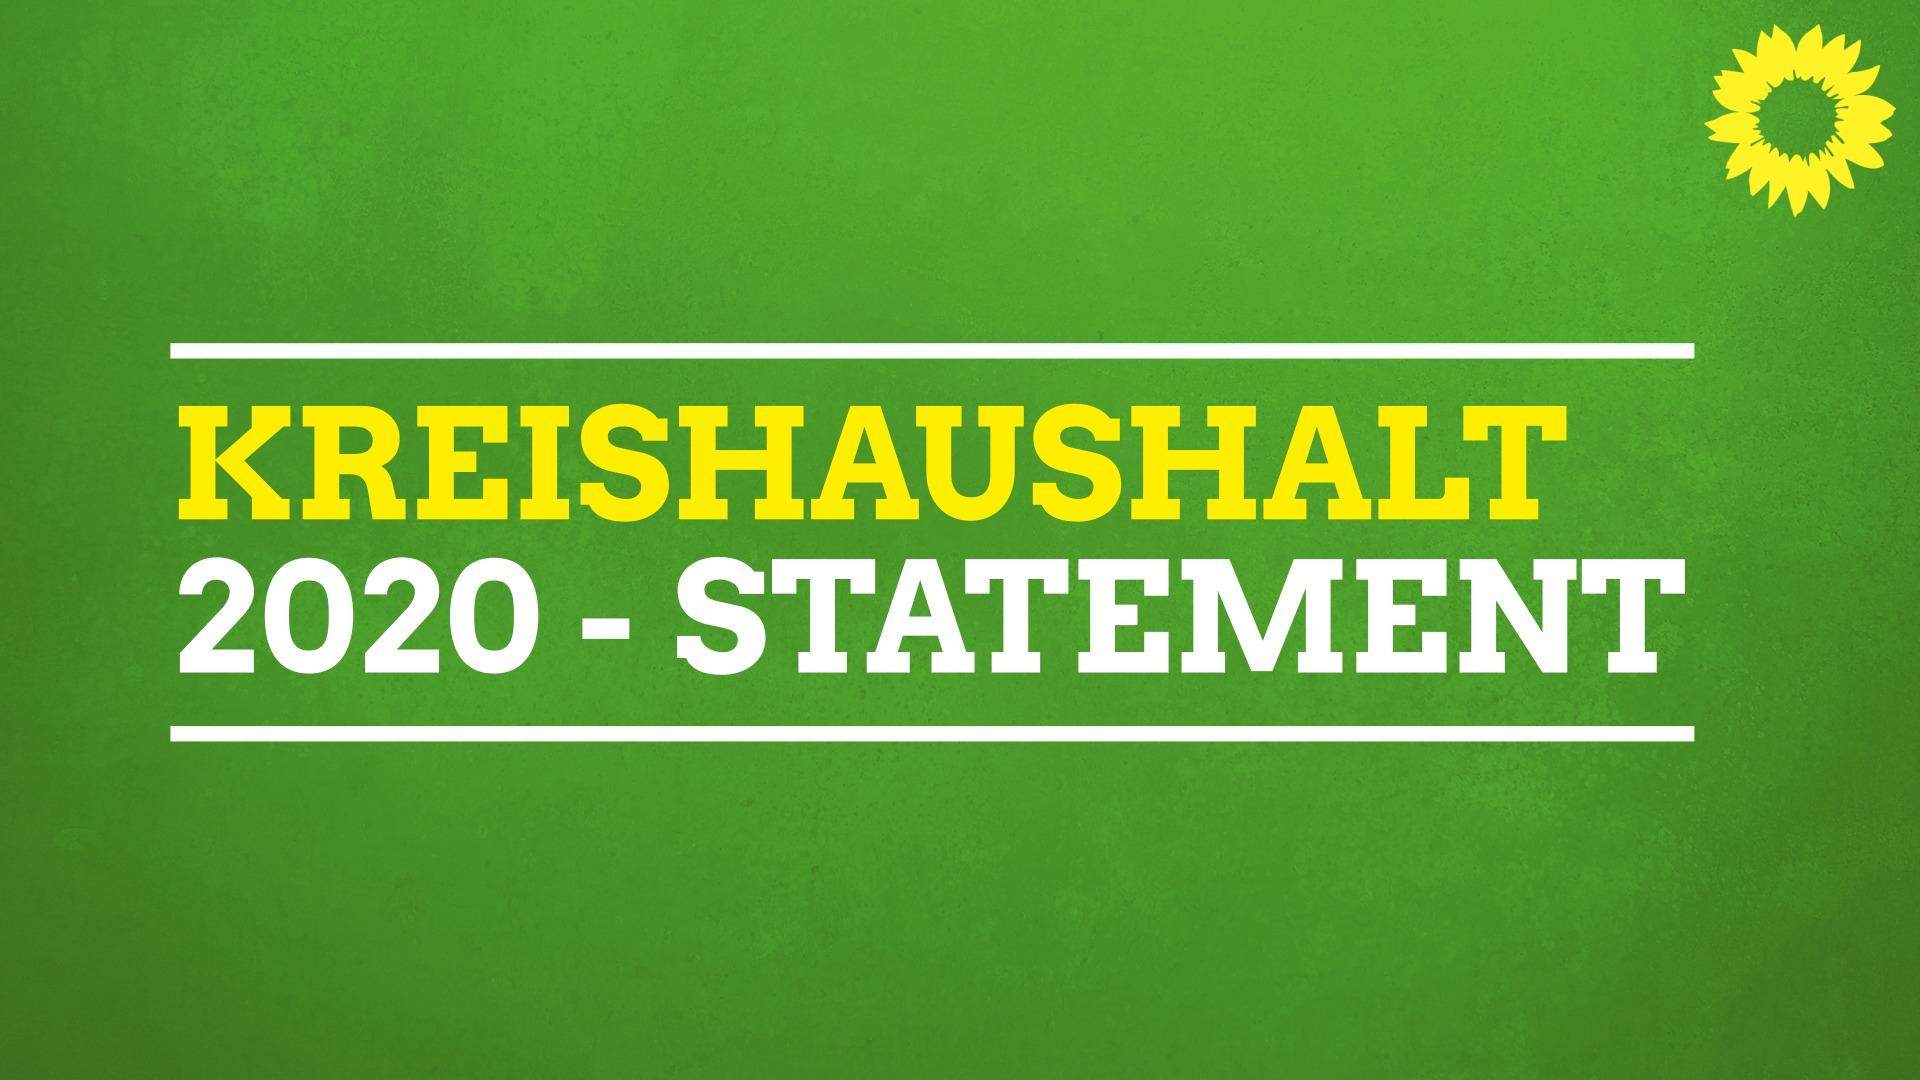 Statement Kreishaushalt